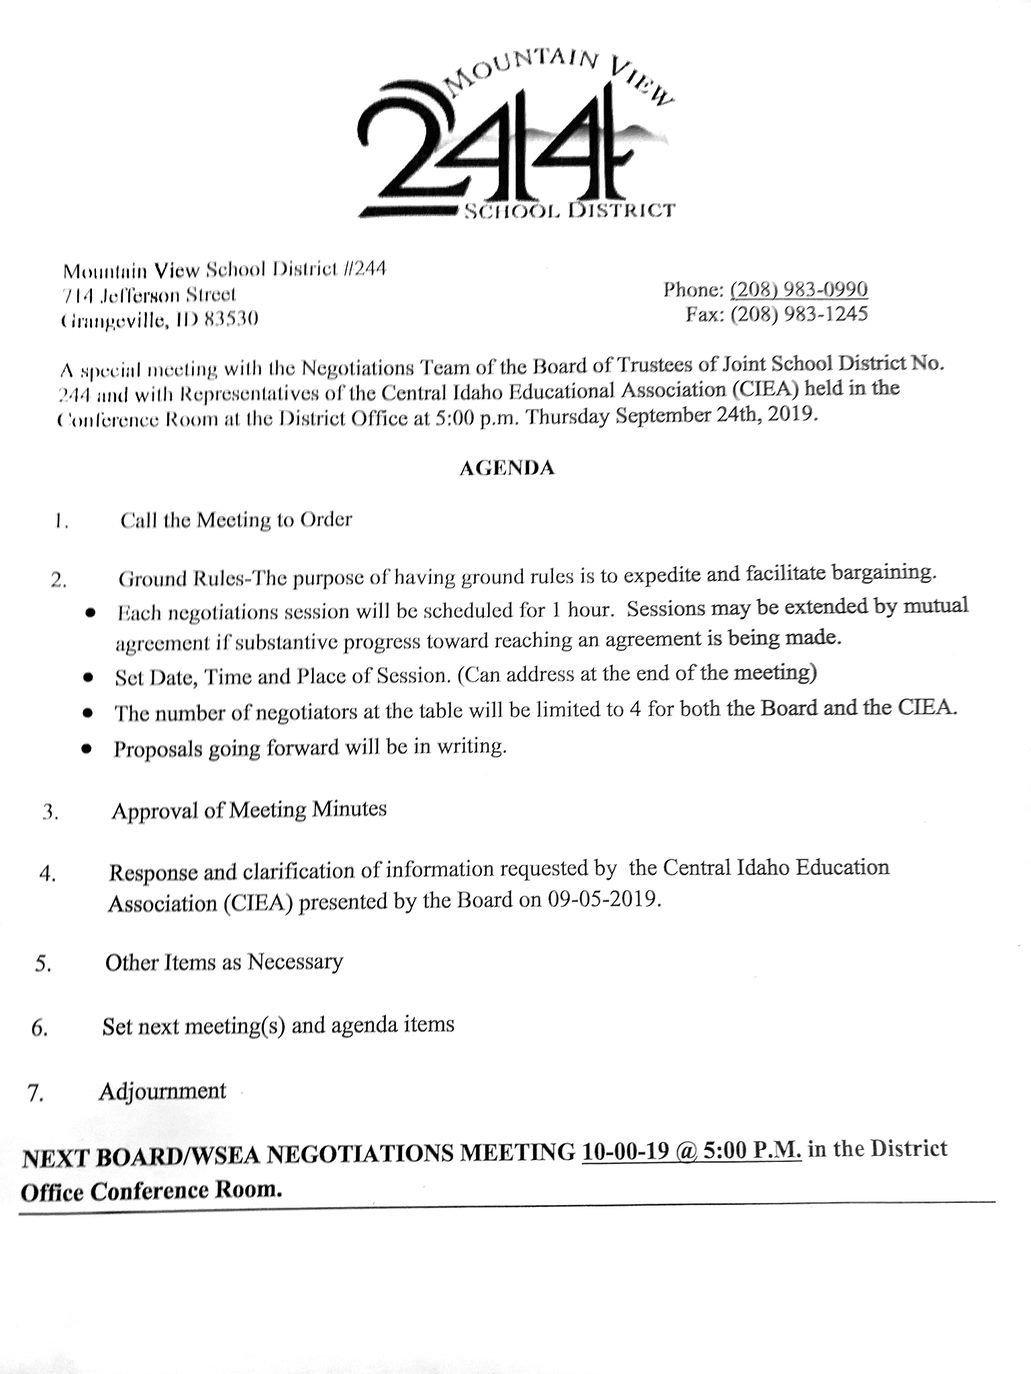 MVSD agenda